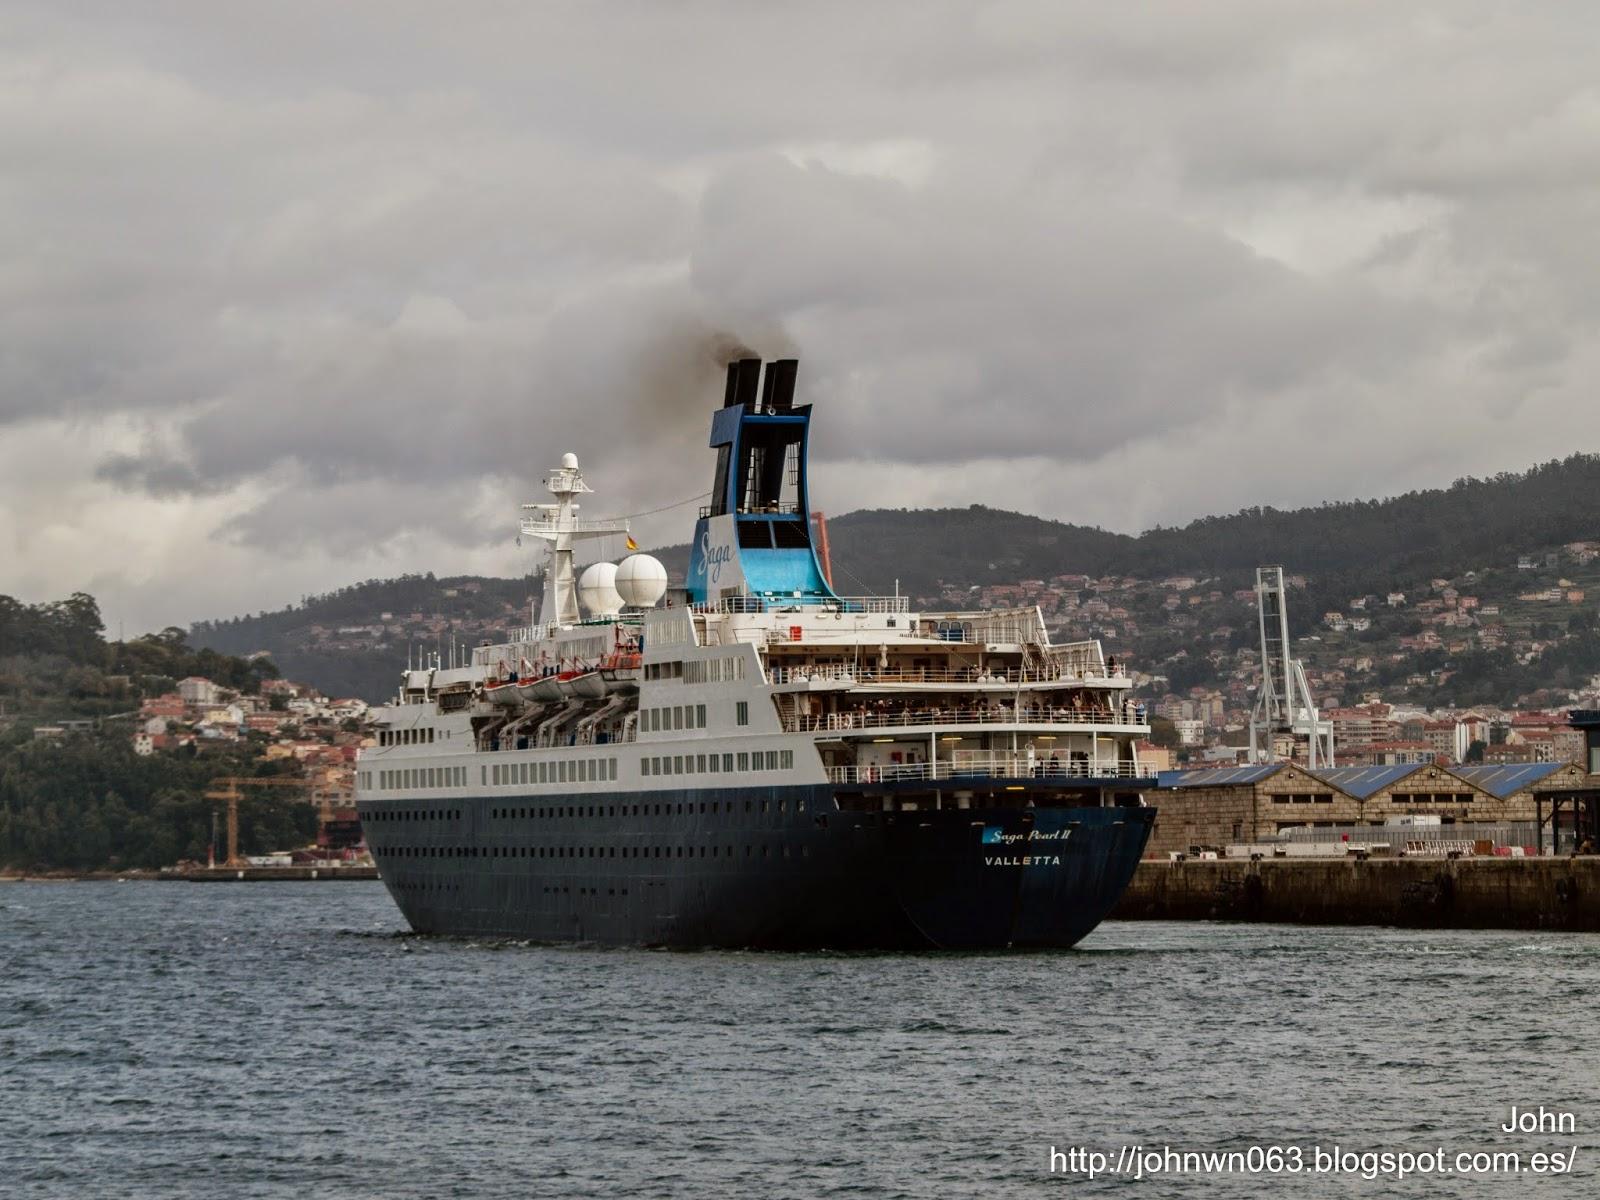 otos de barcos, imagenes de barcos, saga pearl II, saga cruises, crucero, vigo